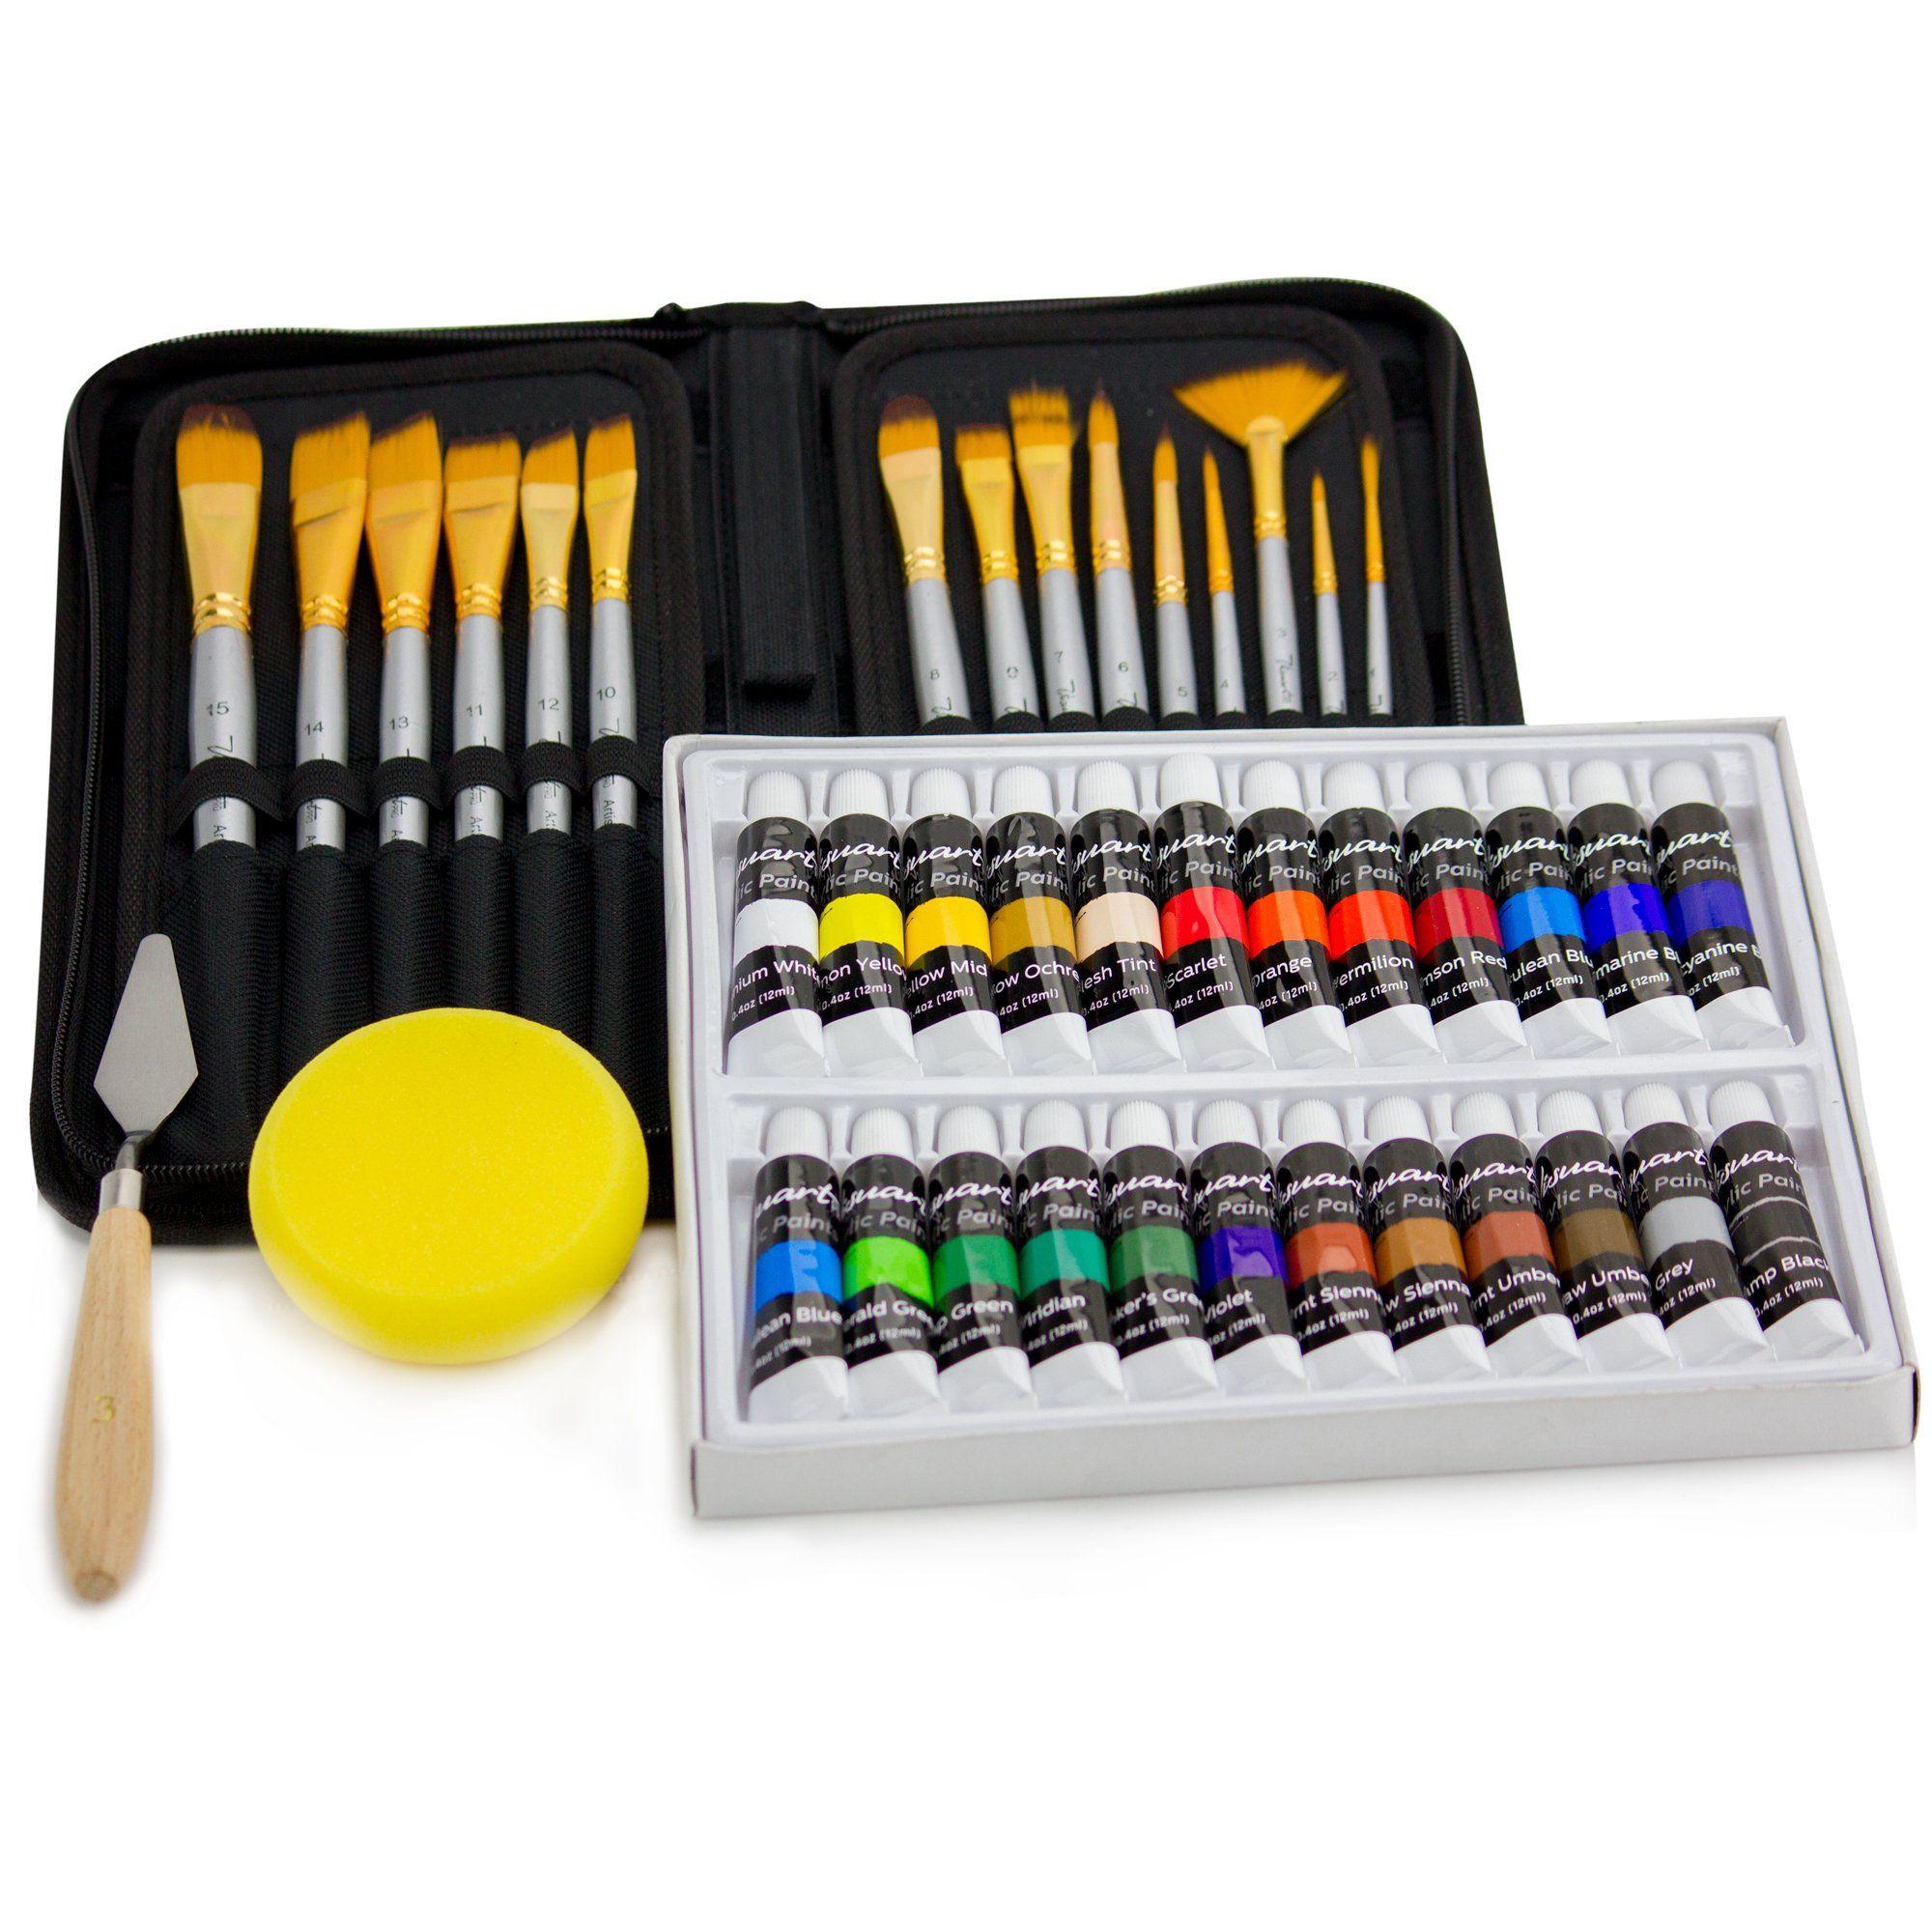 Acrylic paint brush set with 15 premium artist brushes and